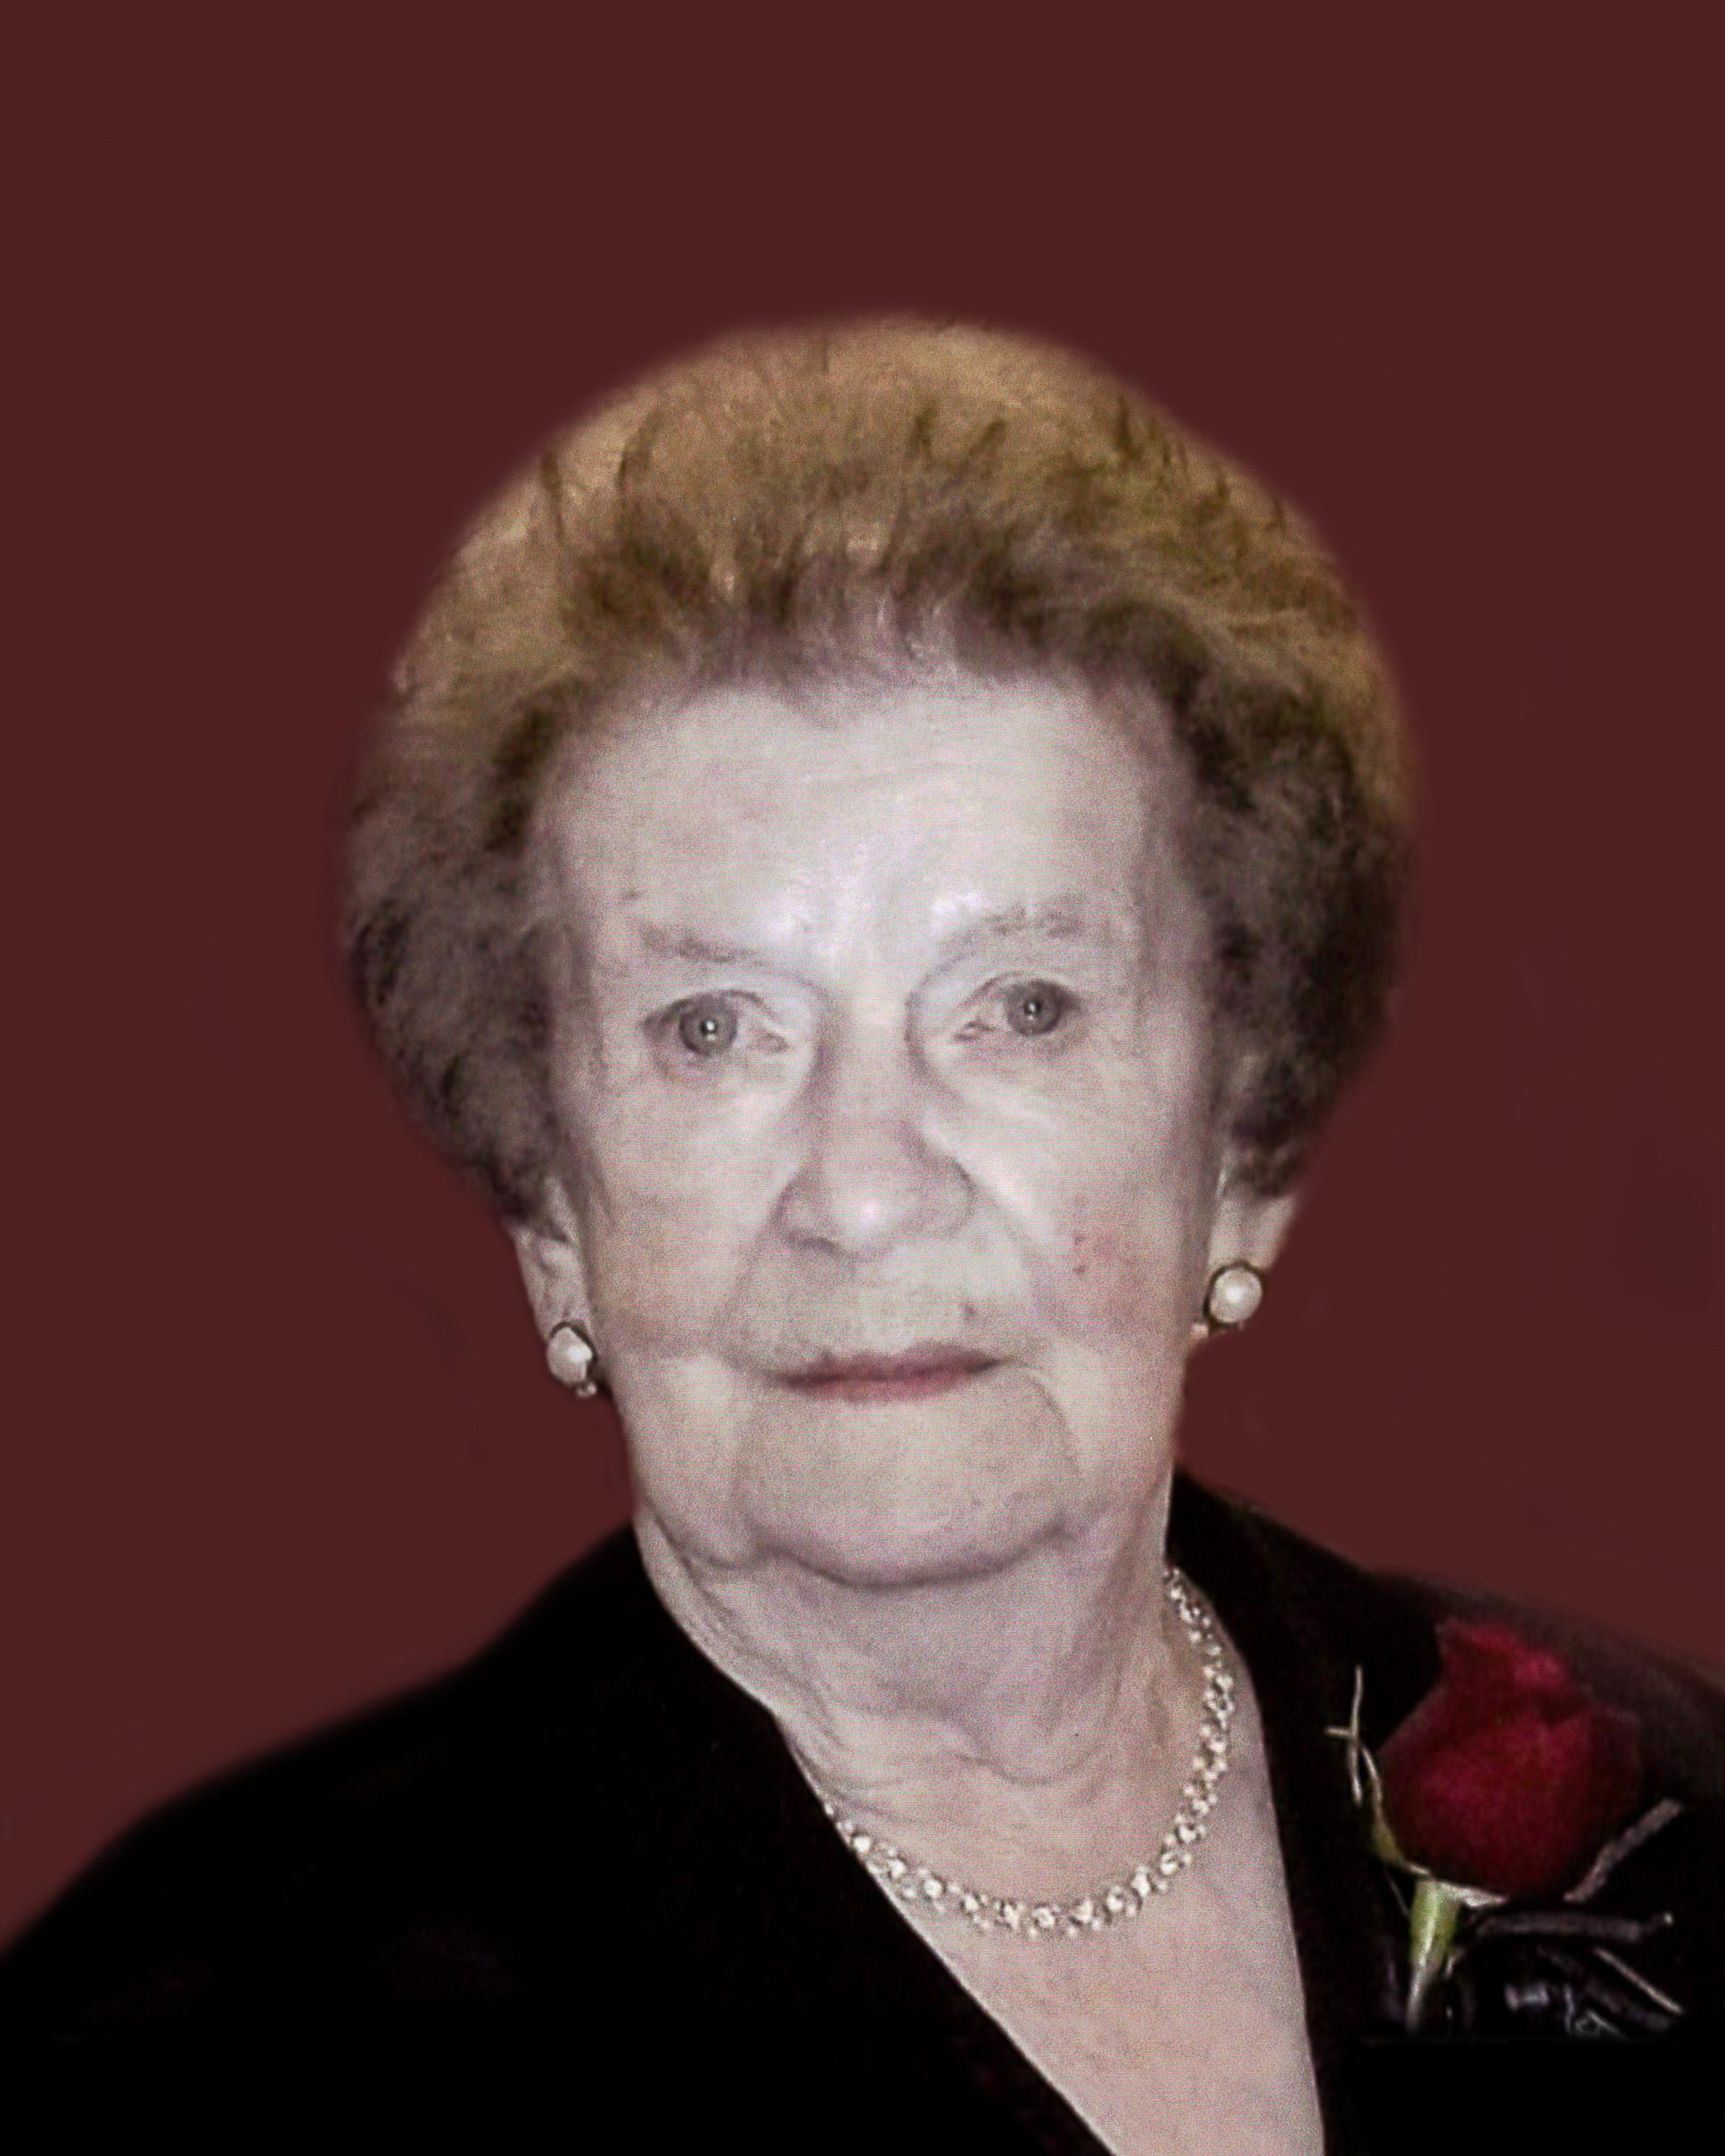 Fobbe, Ethel 8x10.jpg